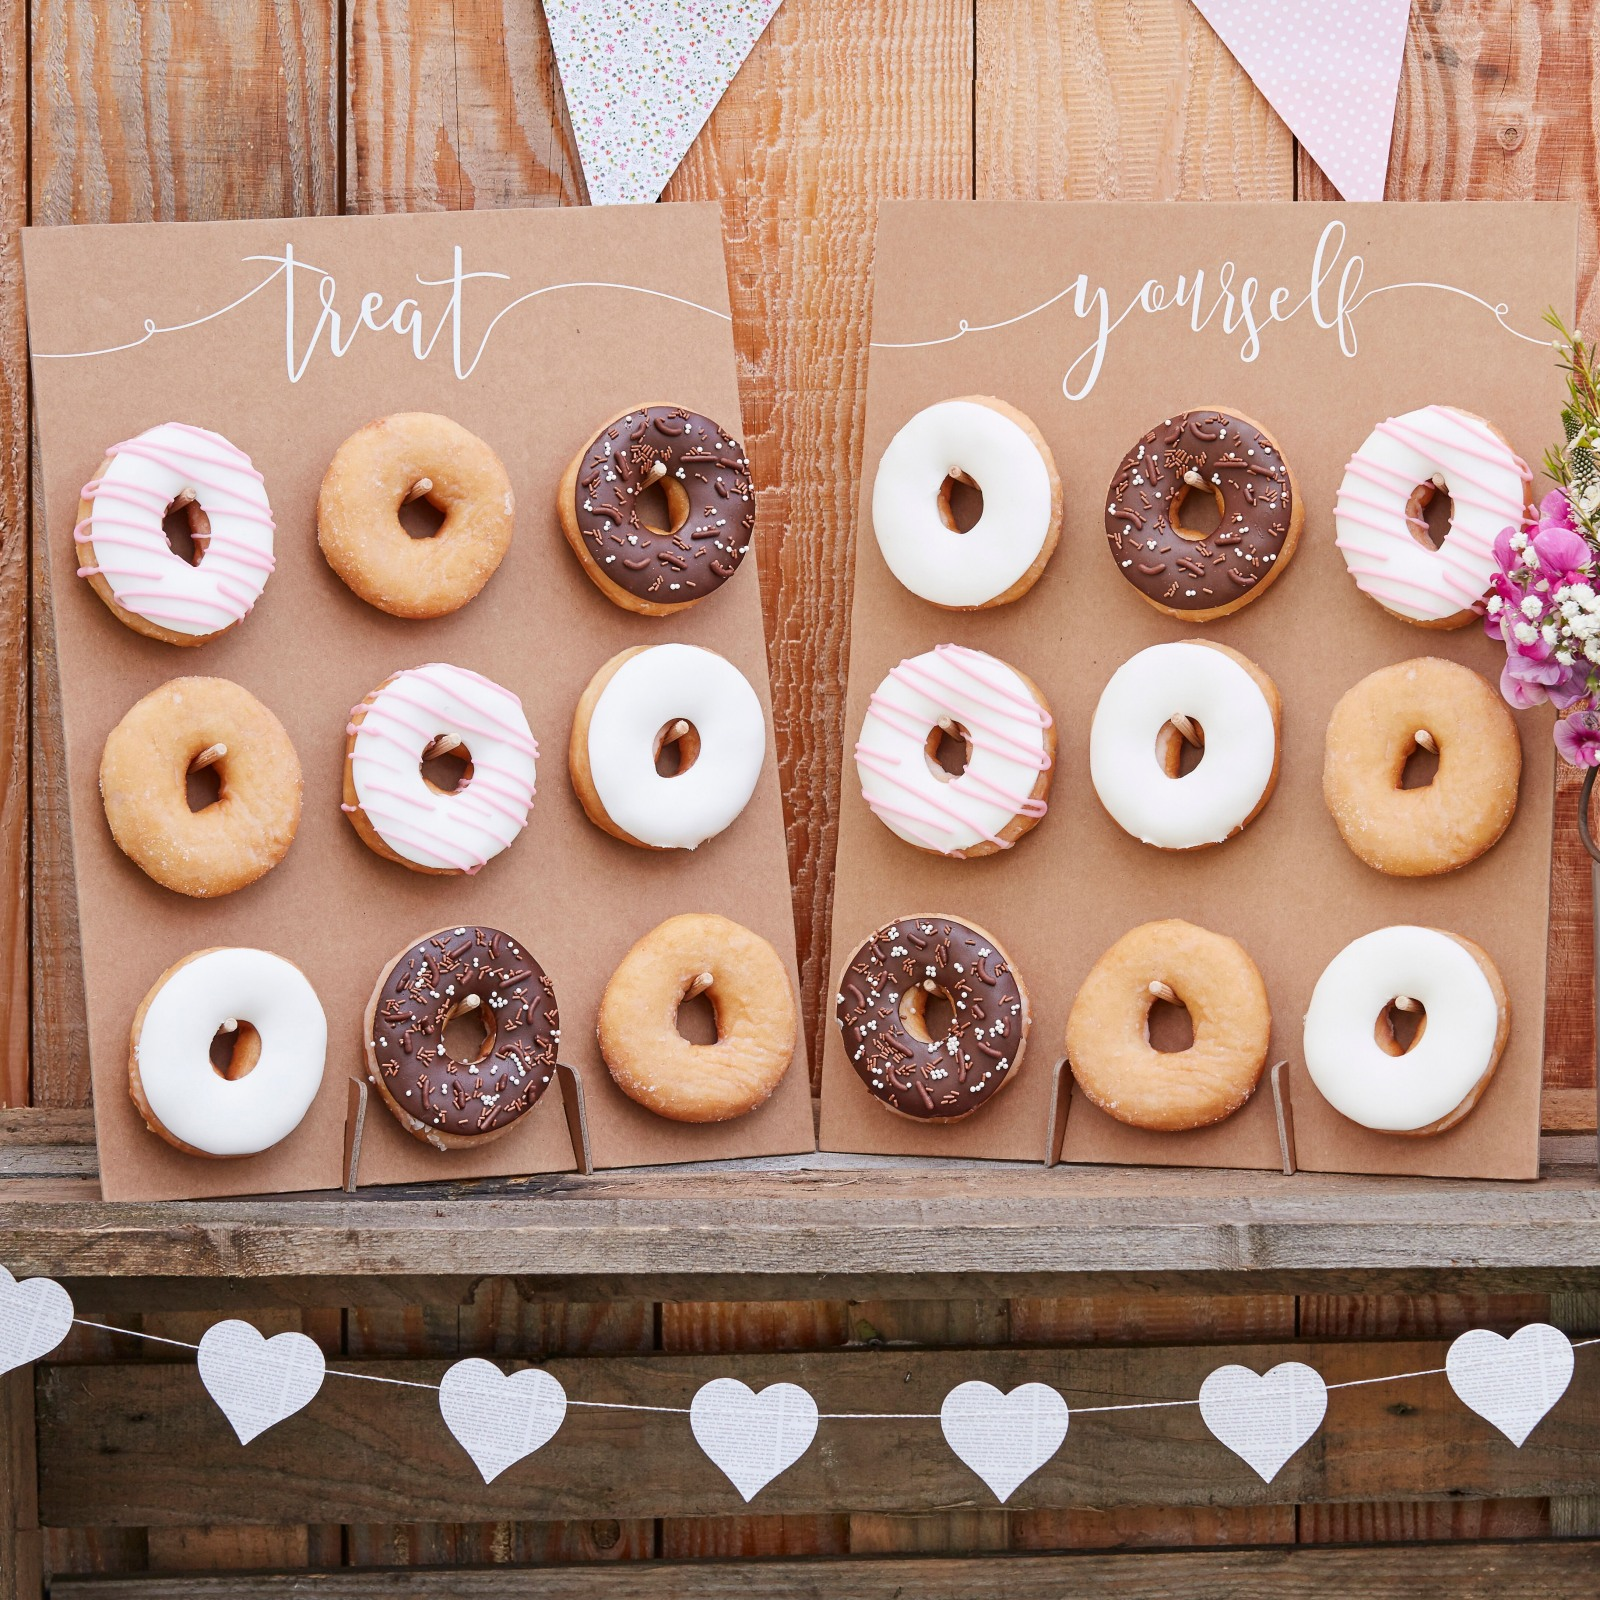 Treat Yourself Donut Wall 10932